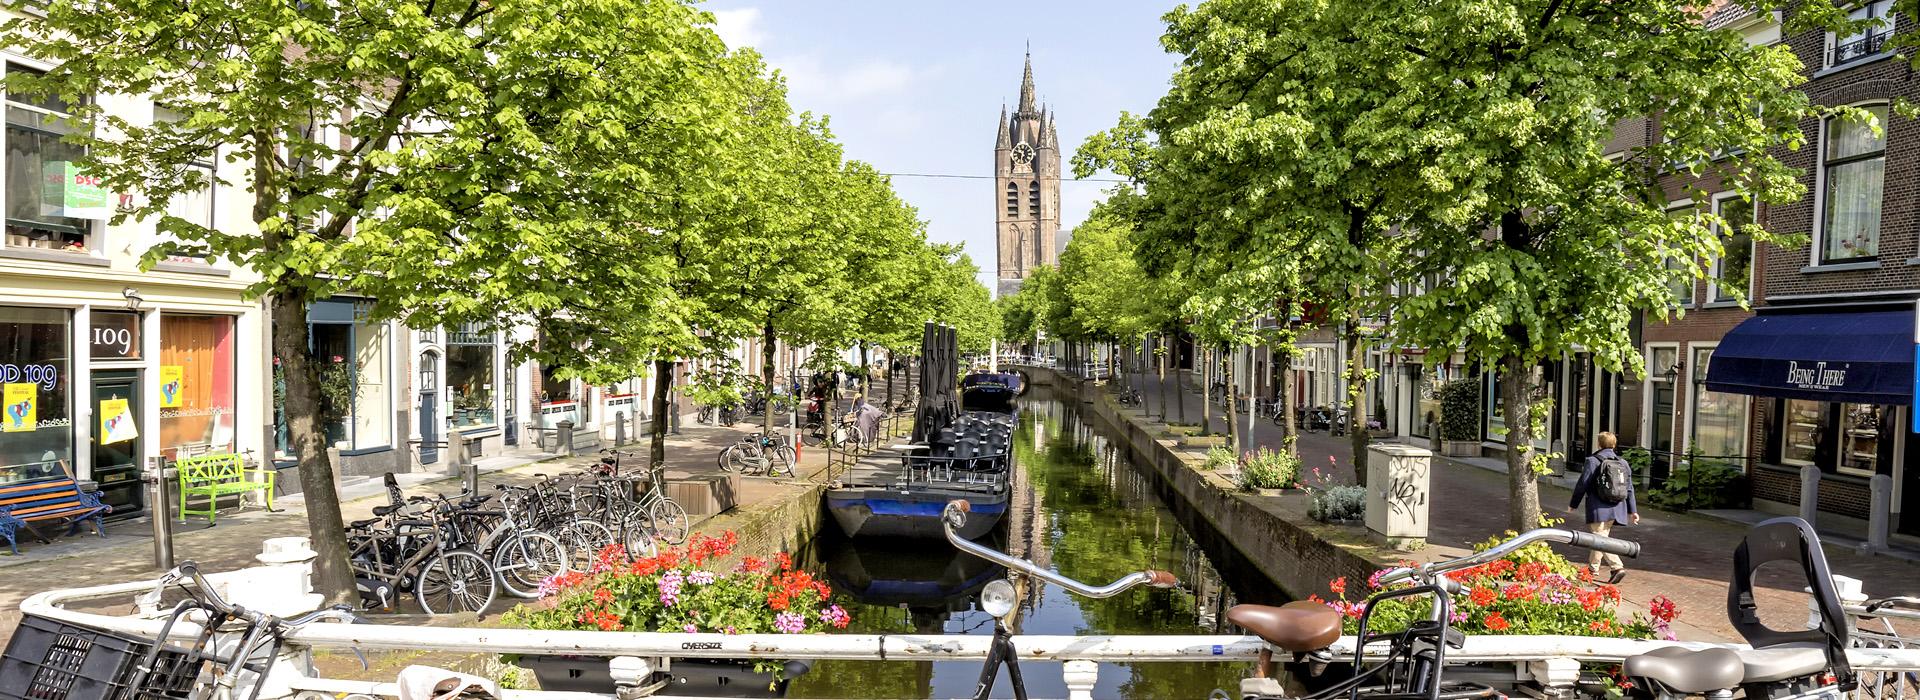 city view of Delft